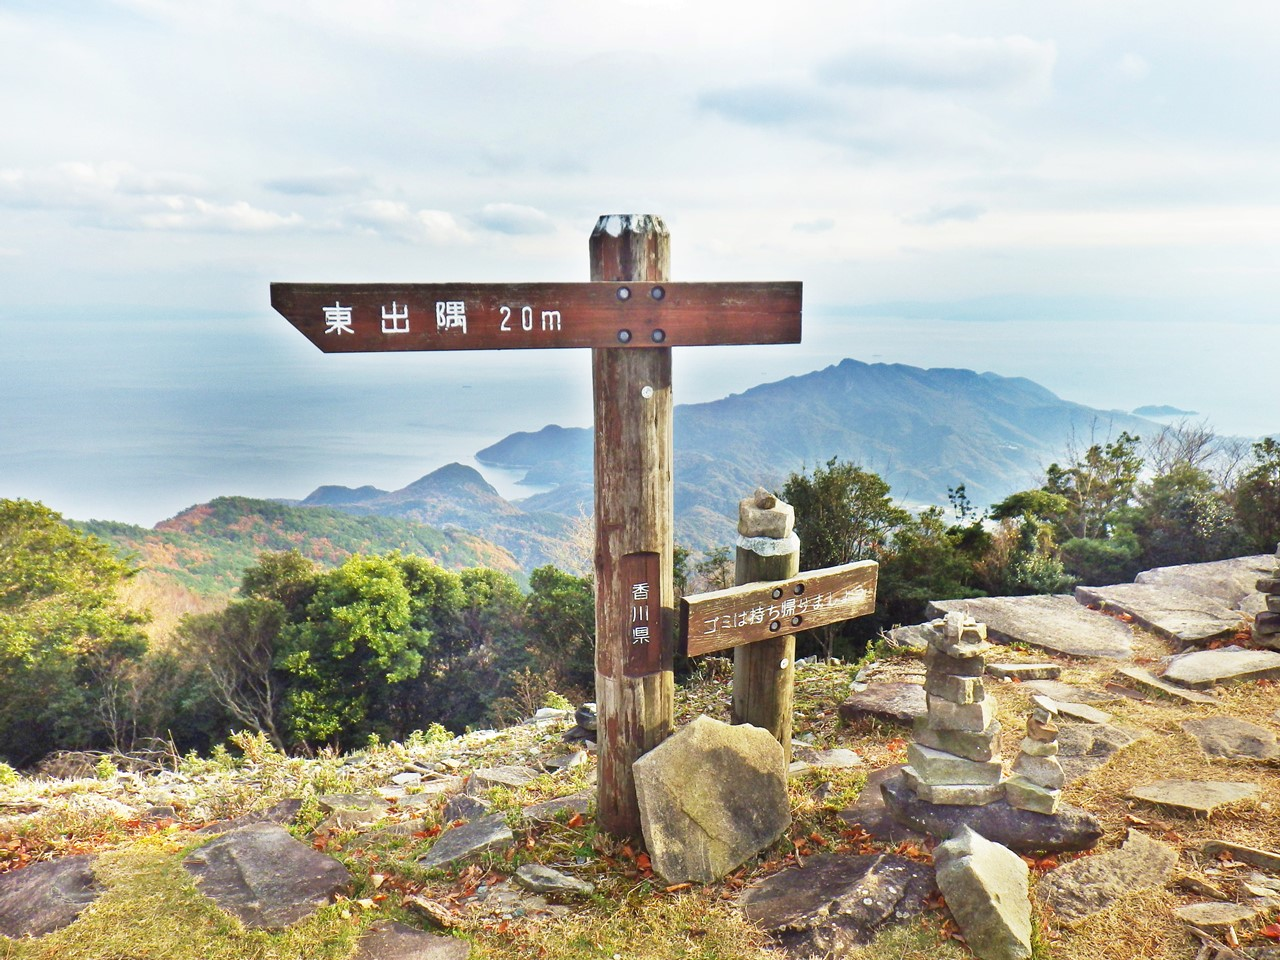 17a 星ヶ城山頂からの眺め